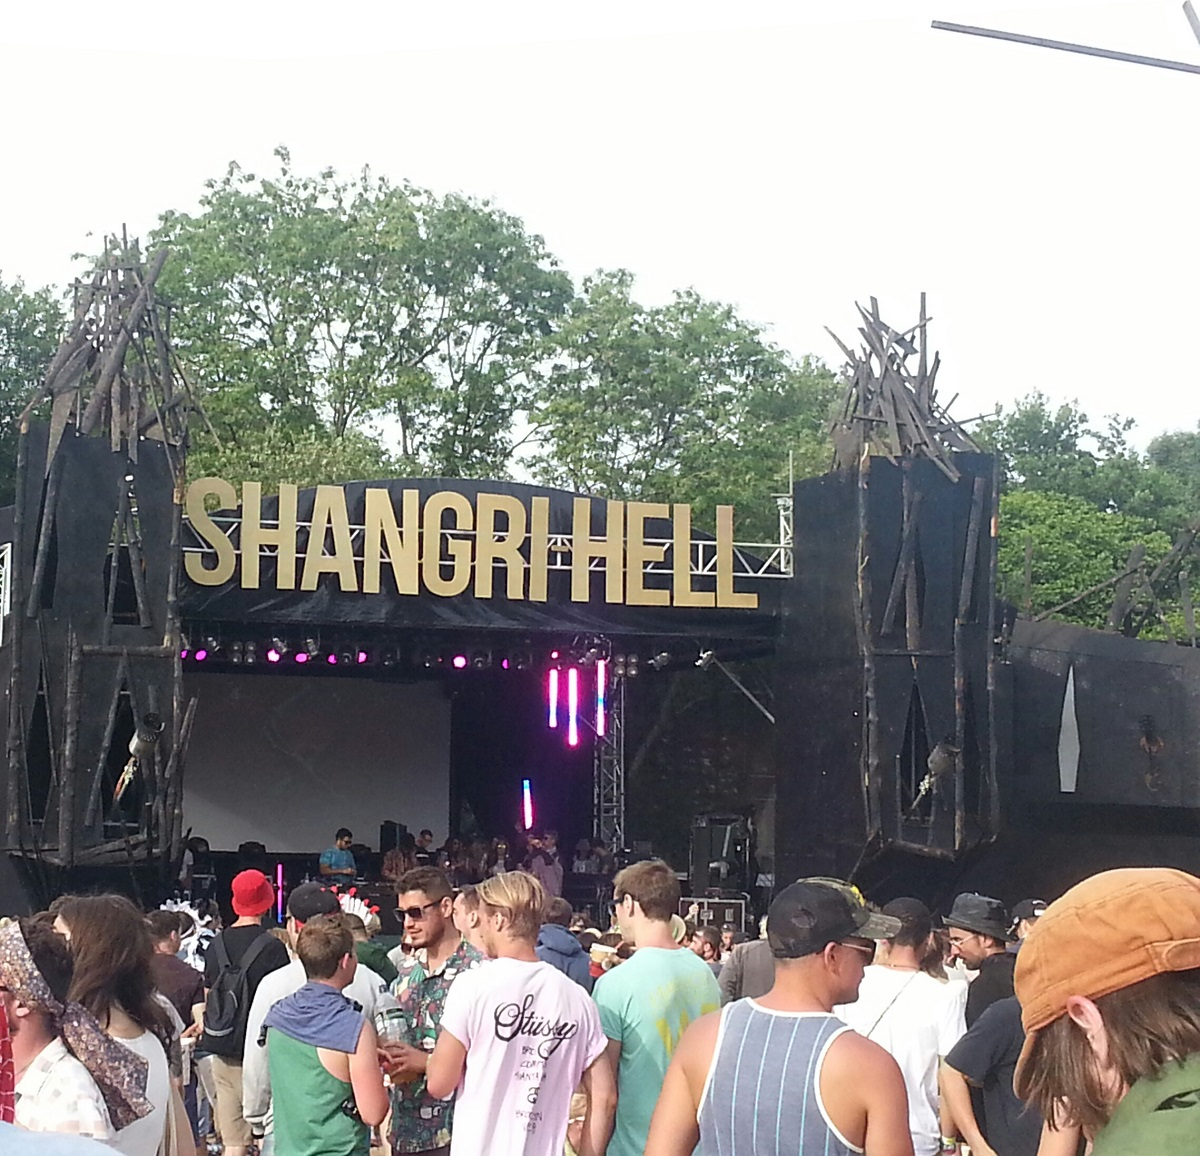 GF - Shangrihell